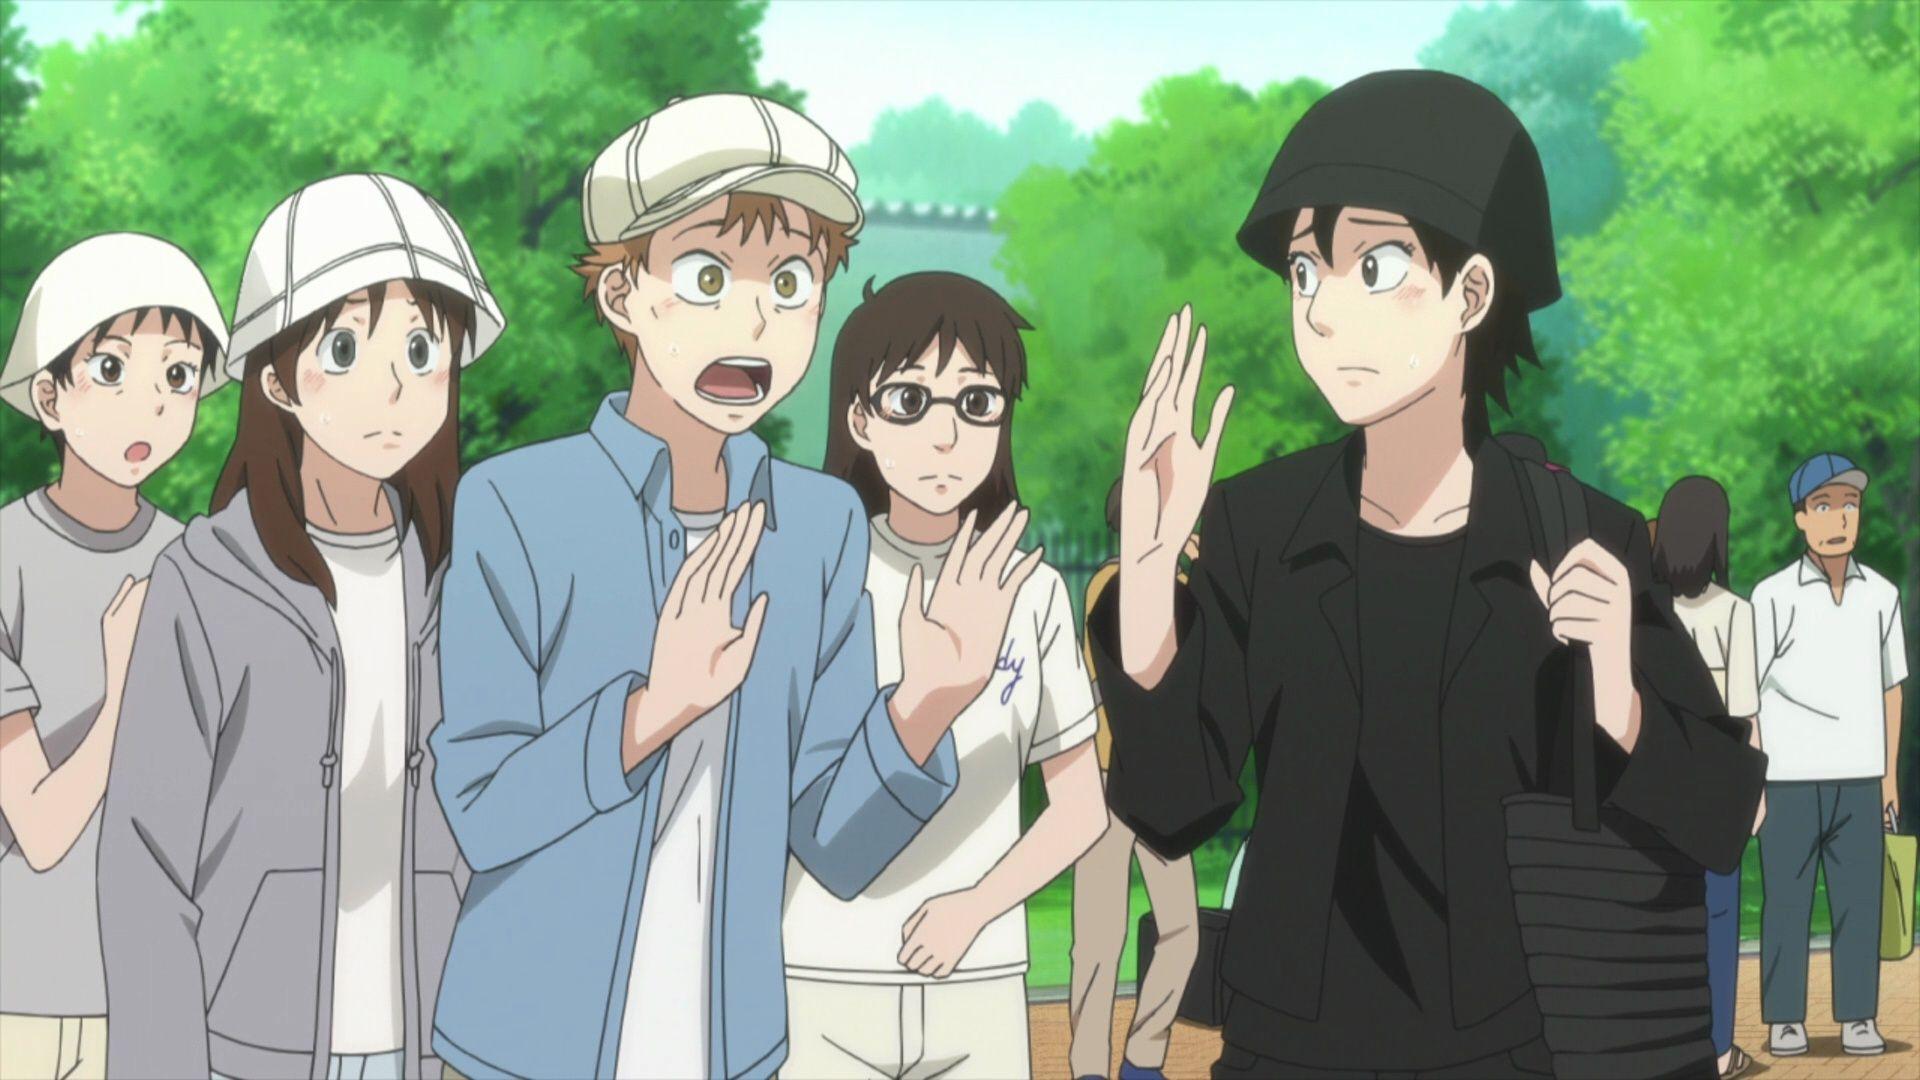 Nombra el anime de la imagen! (Leer primer post) 639466ahah